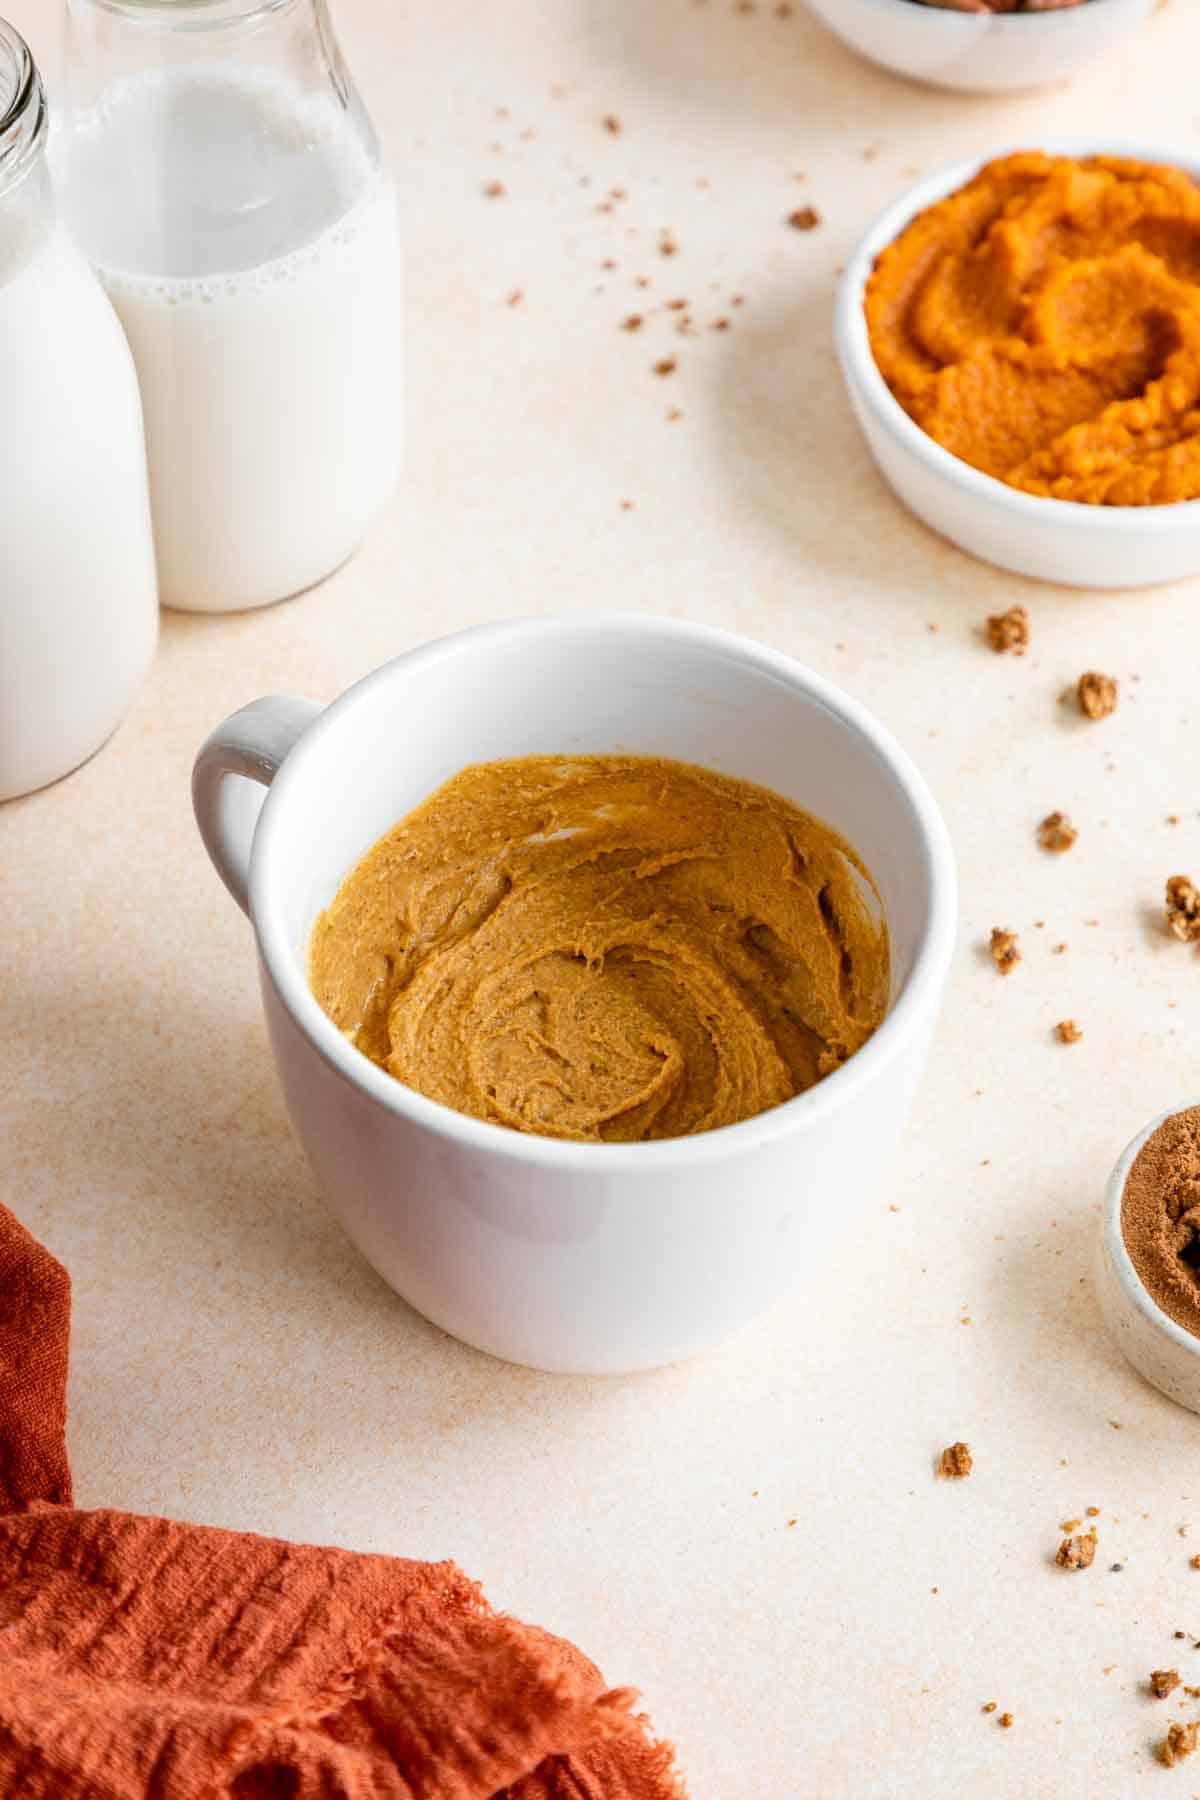 vegan gluten-free pumpkin cake batter inside a white mug